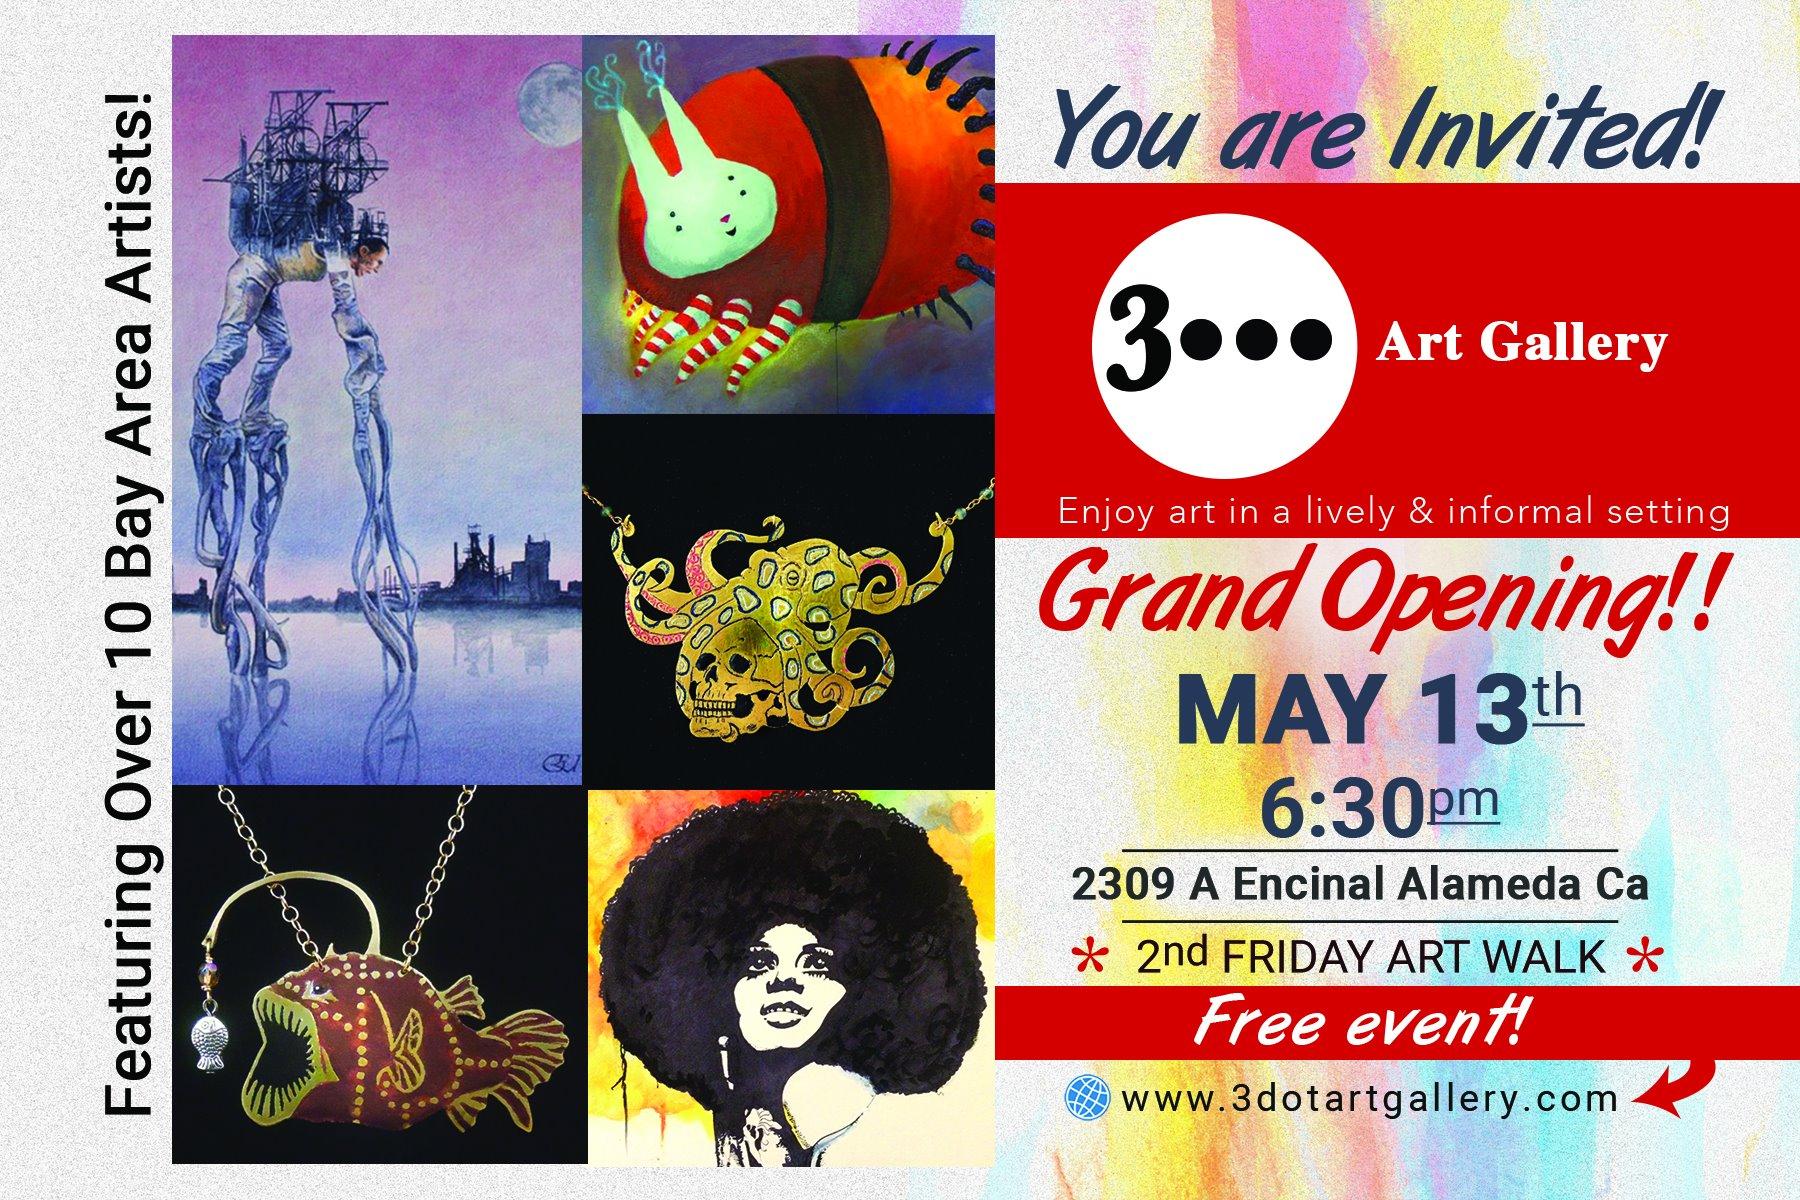 3 Dot Grand Opening